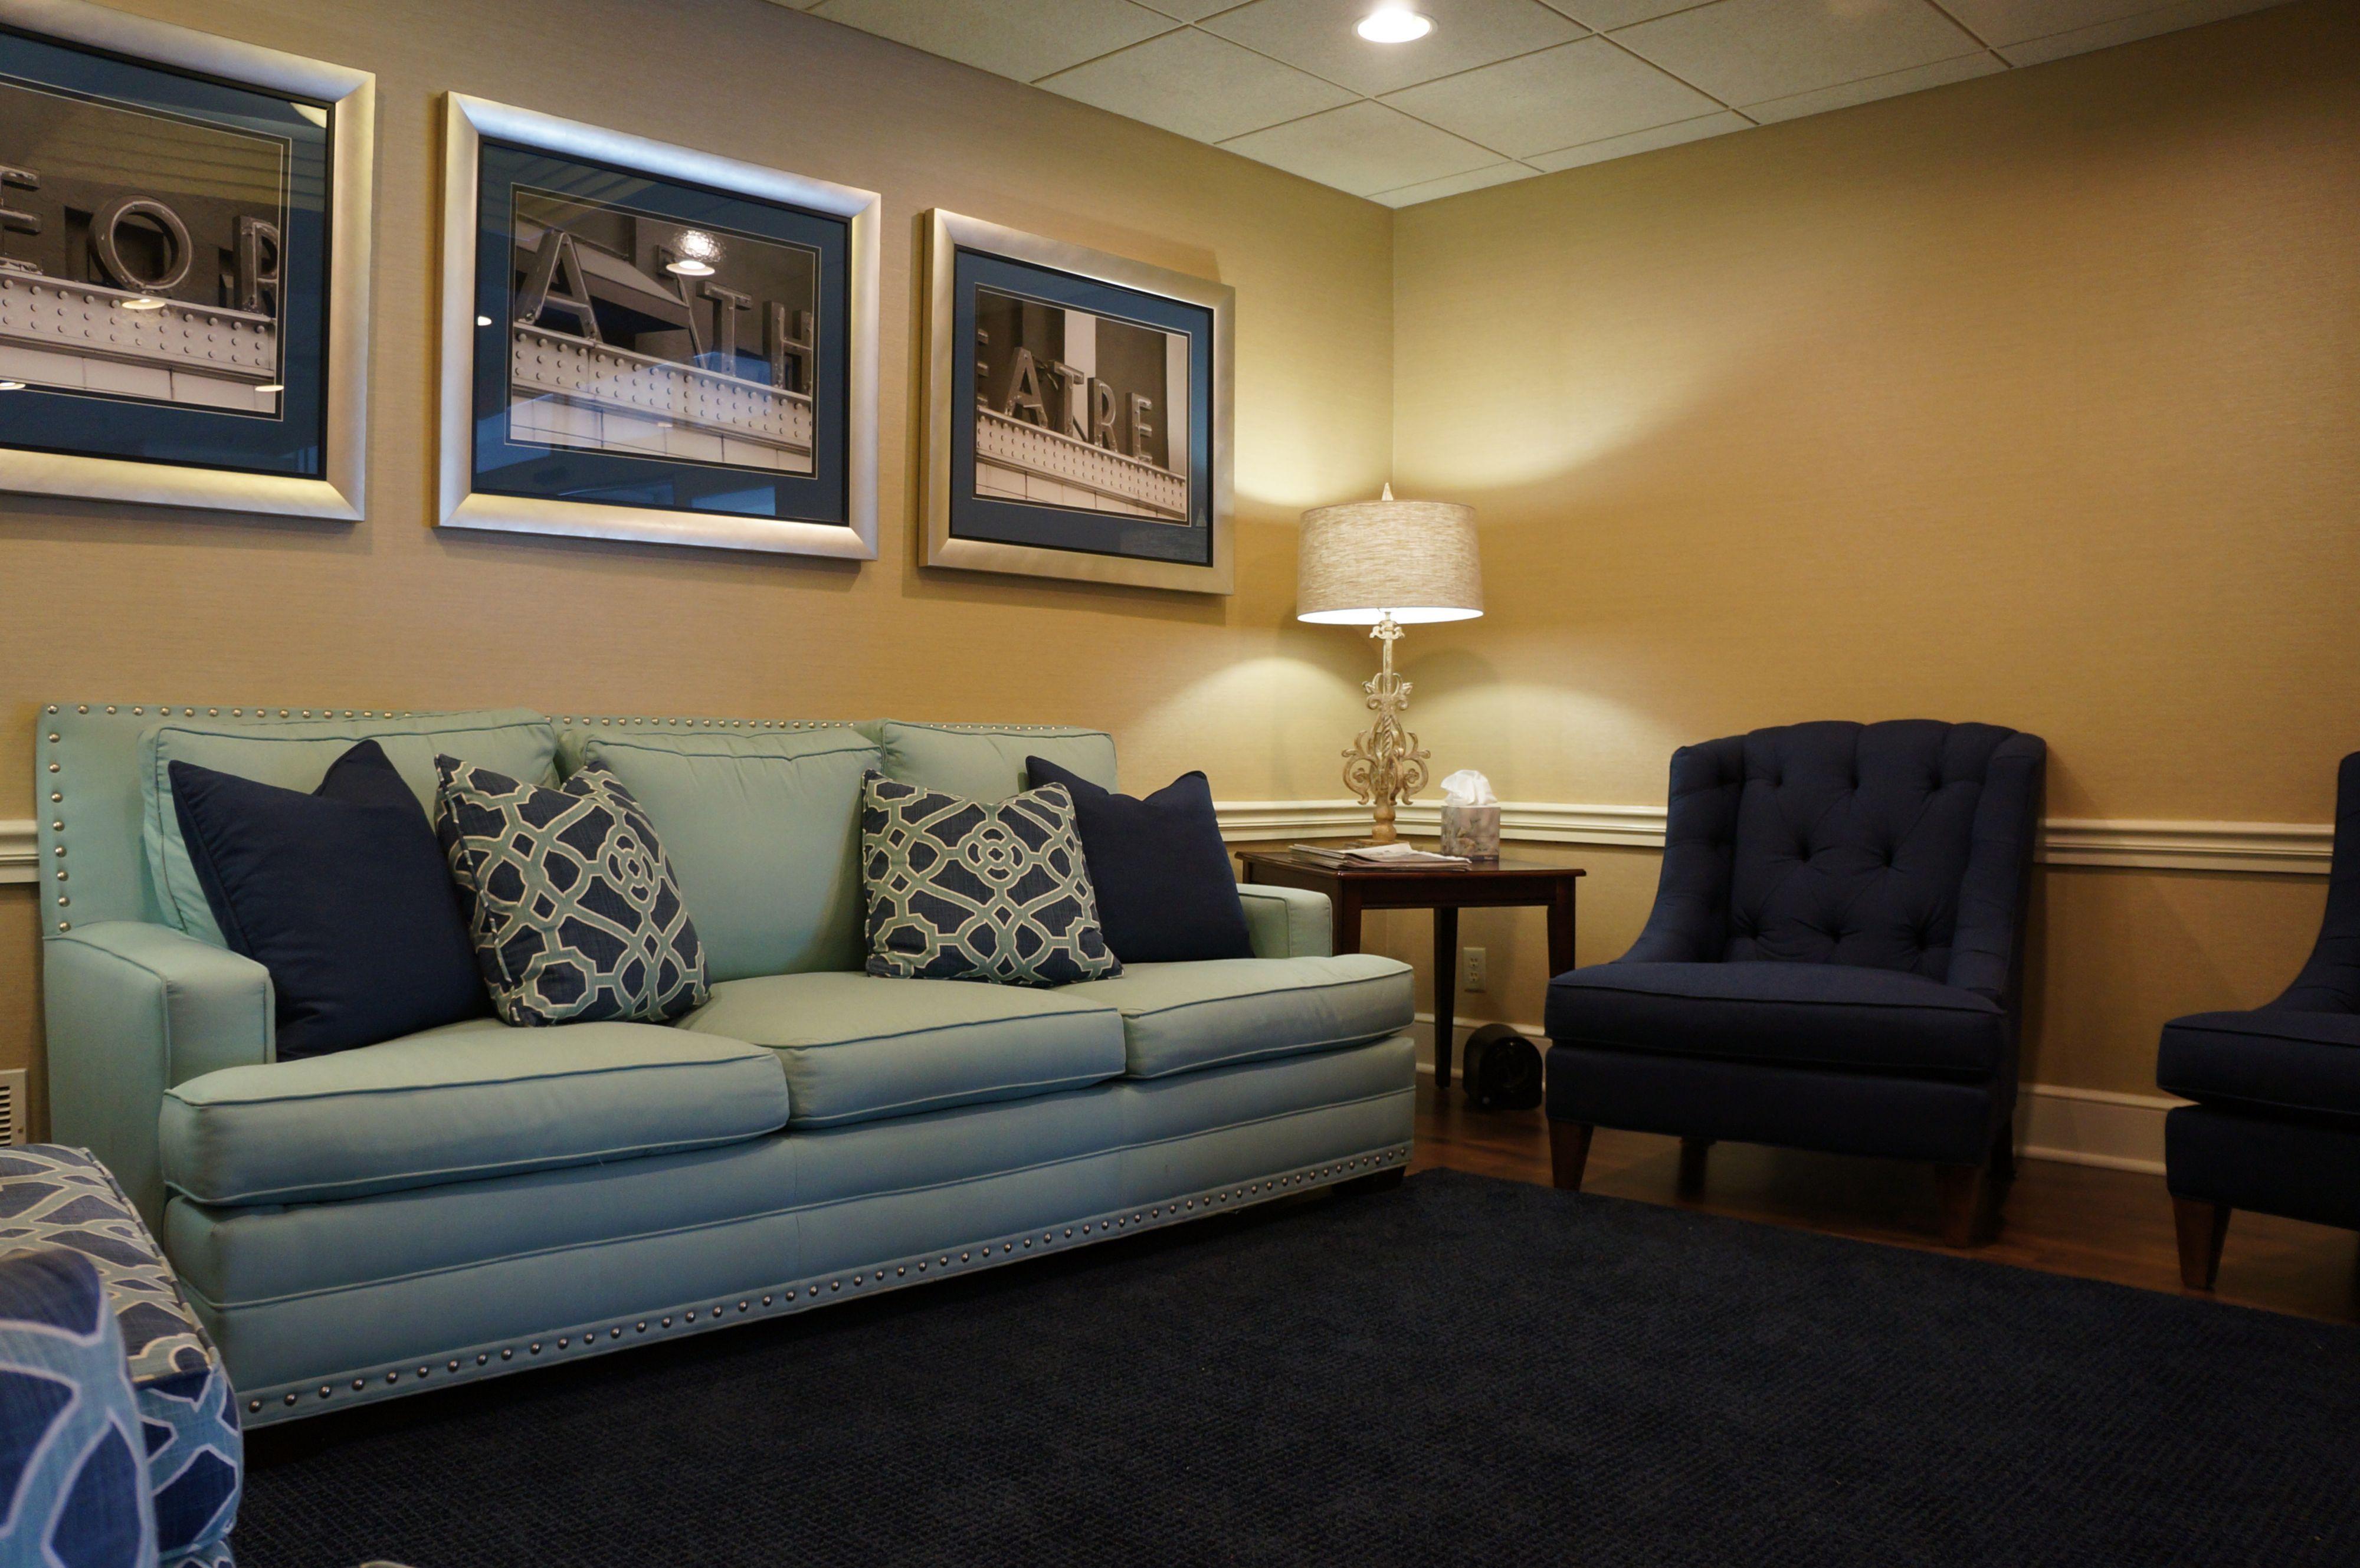 Holiday Inn Athens-University Area image 6